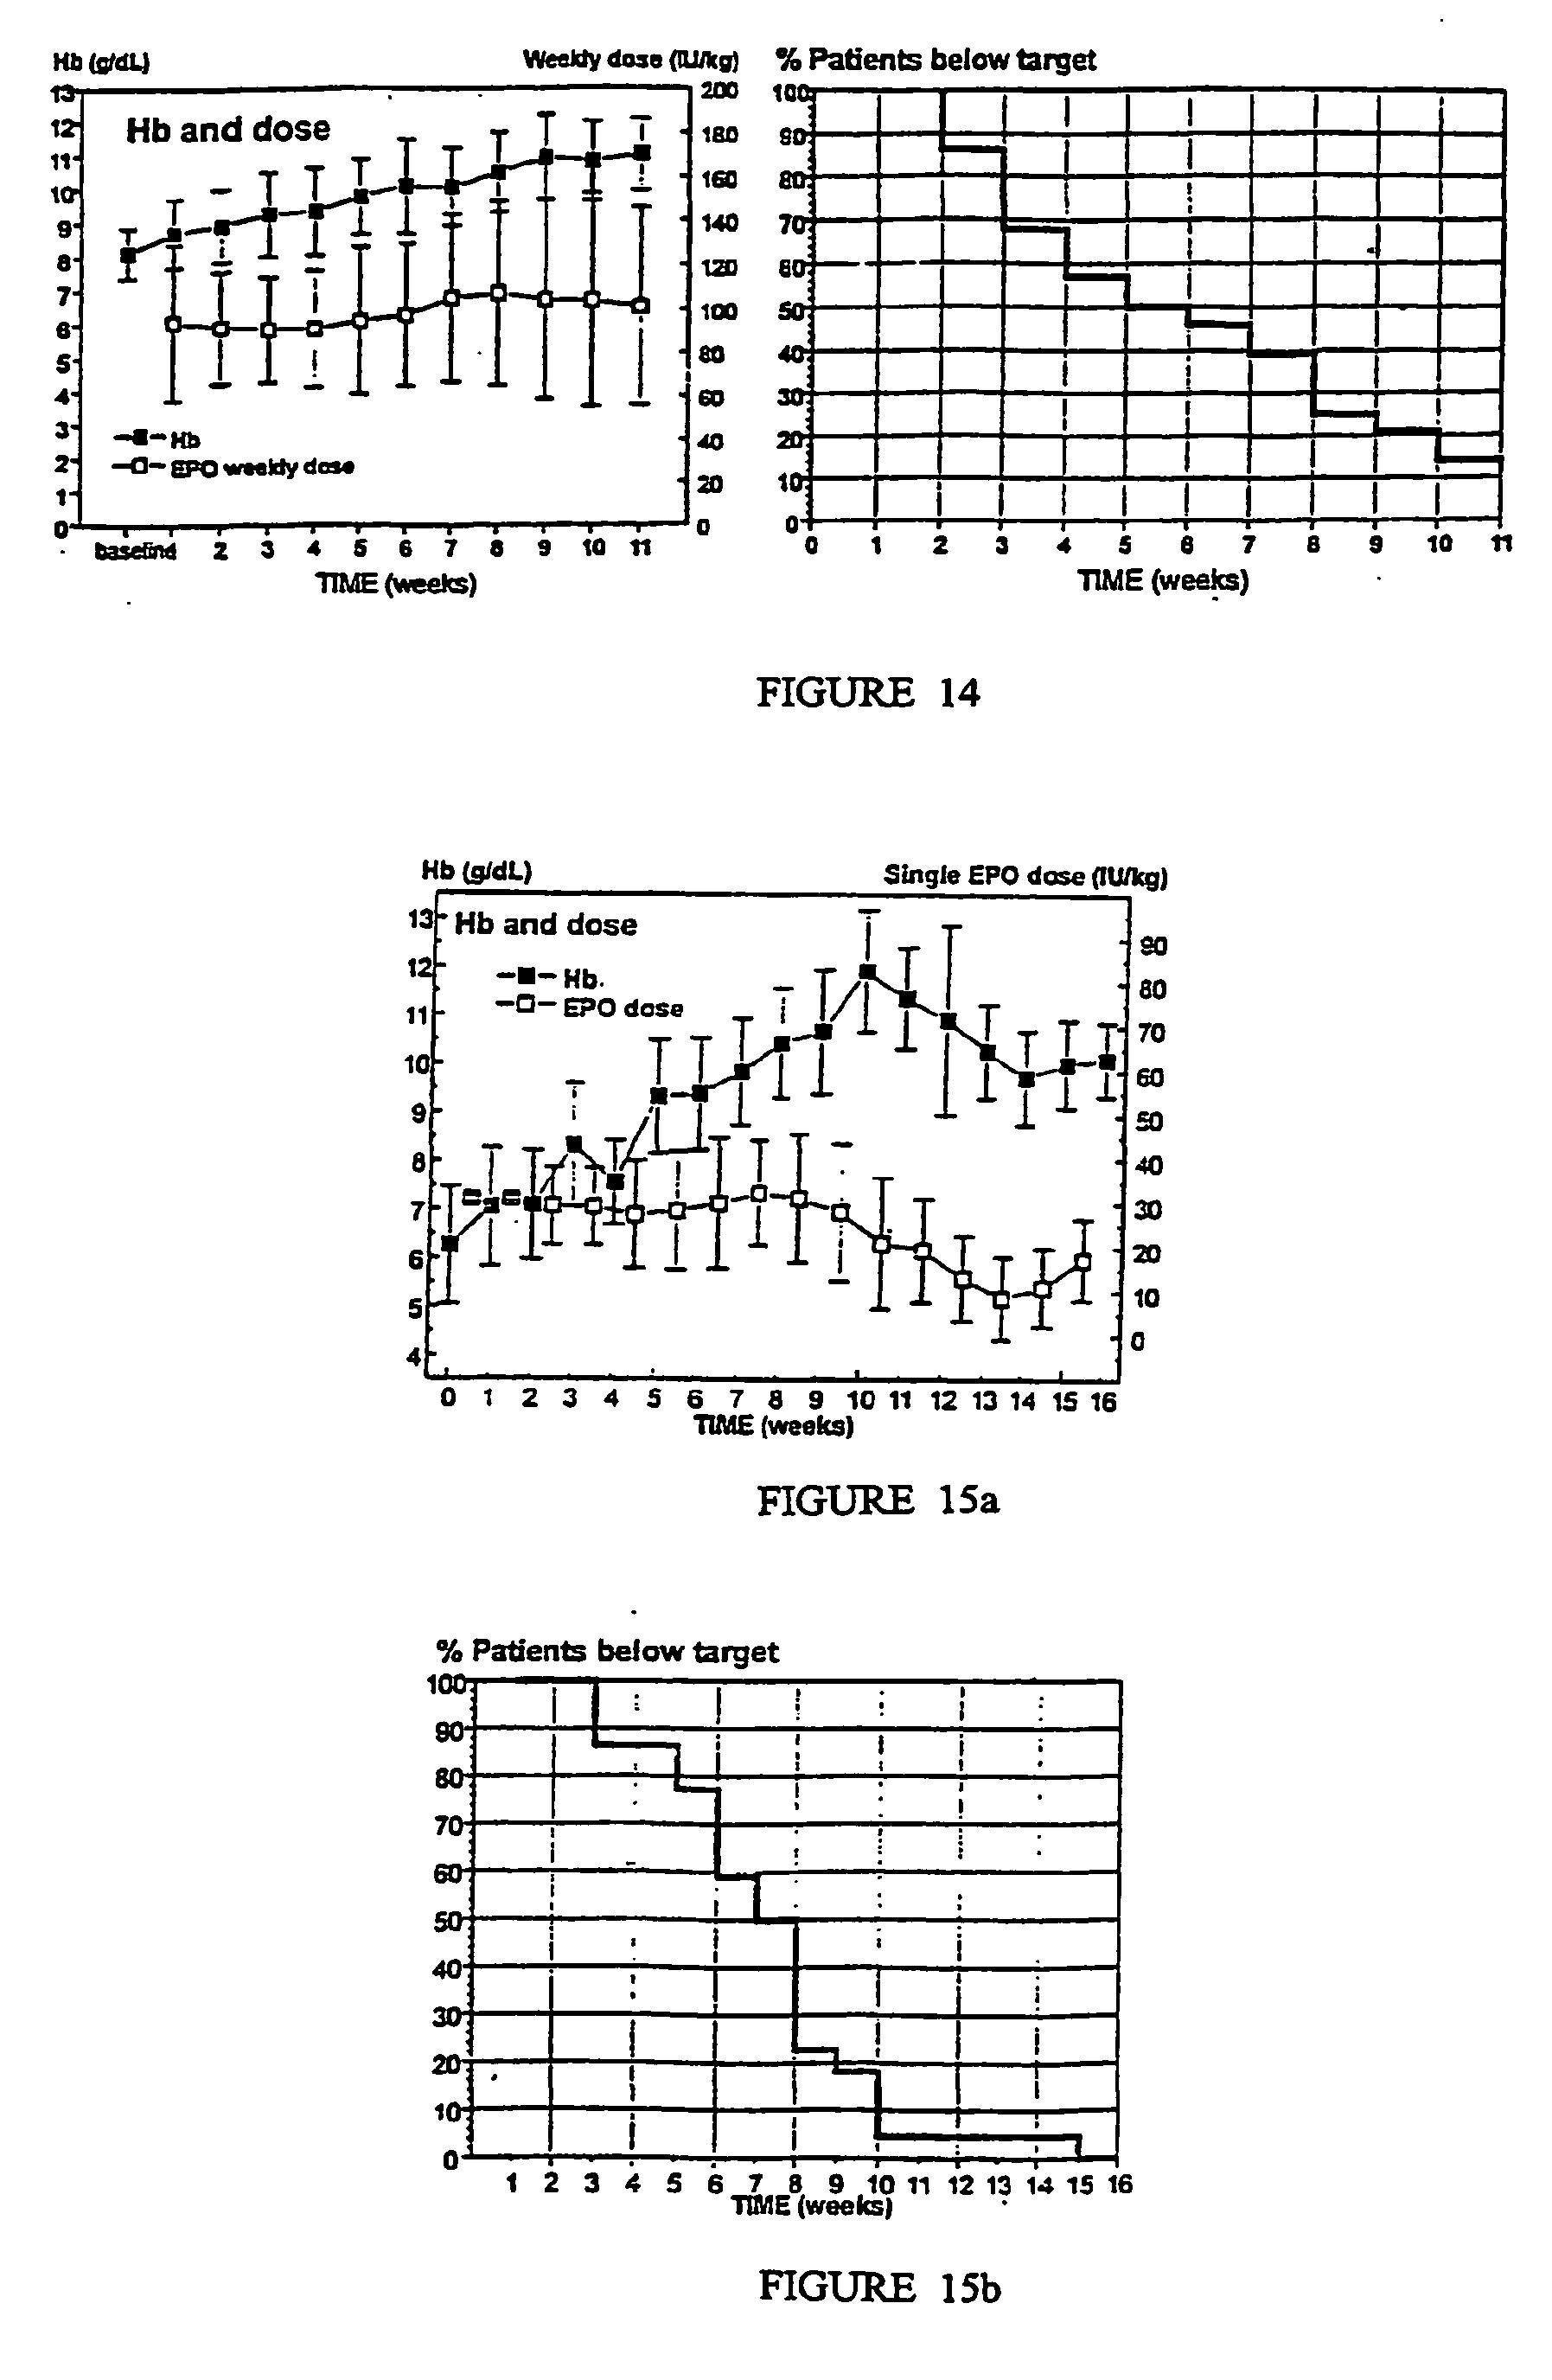 1999 chevy cavalier wiring diagram gt 4599  1999 cavalier radio wiring diagram  gt 4599  1999 cavalier radio wiring diagram